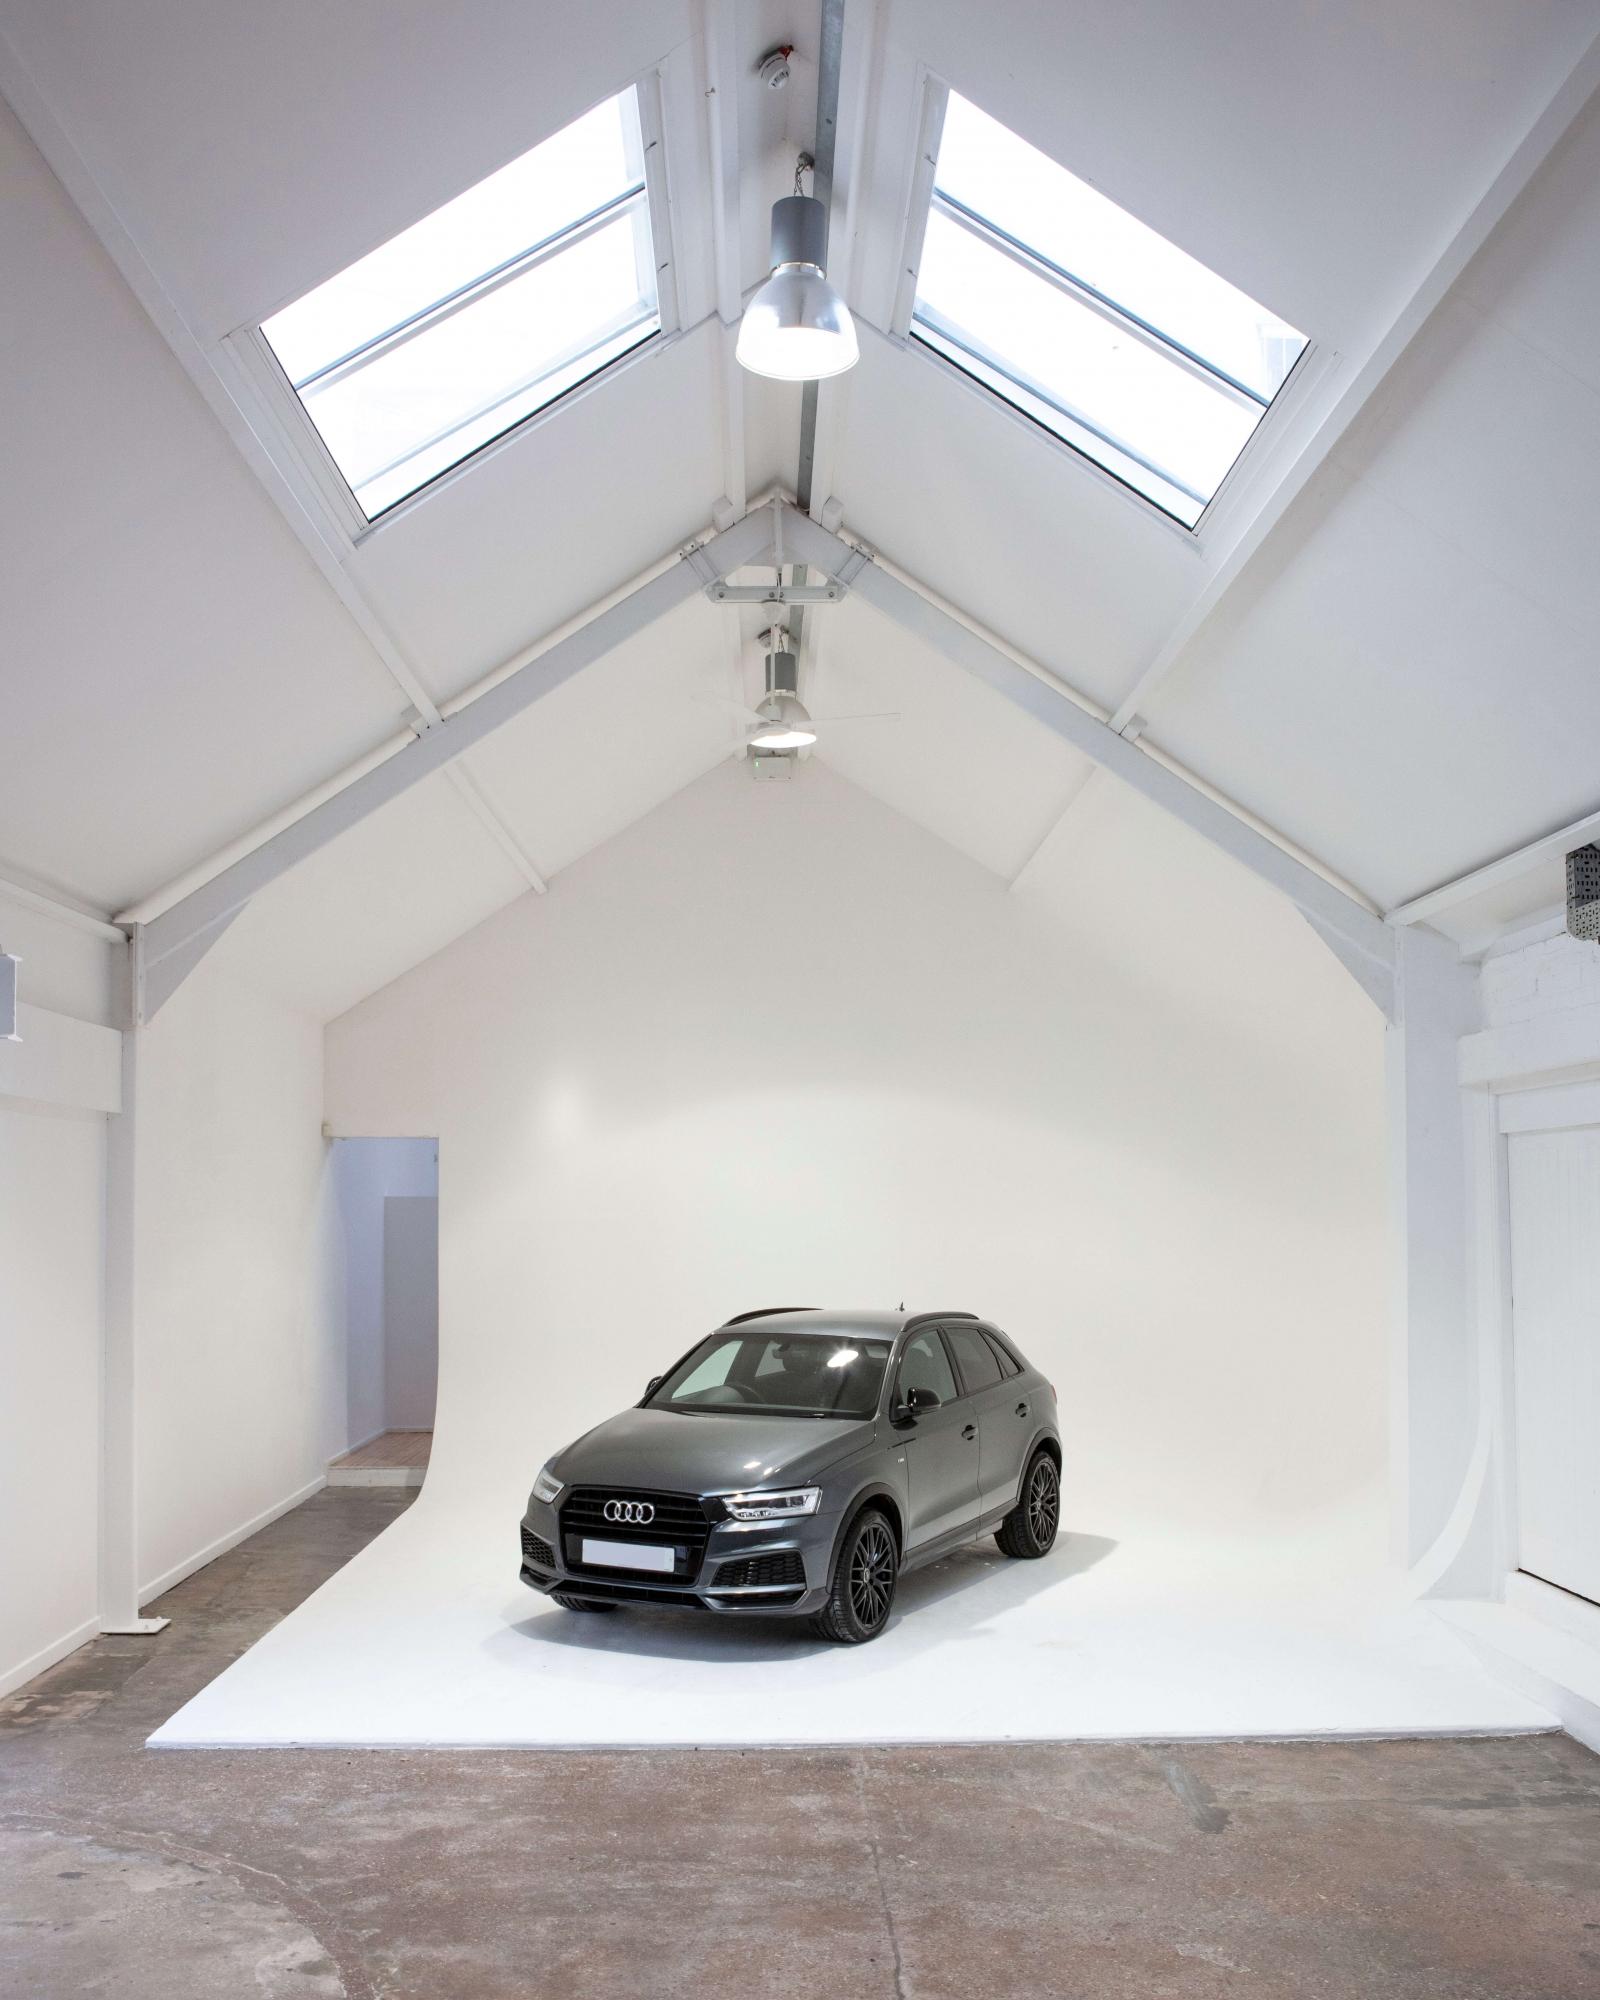 fiveourstudios Car